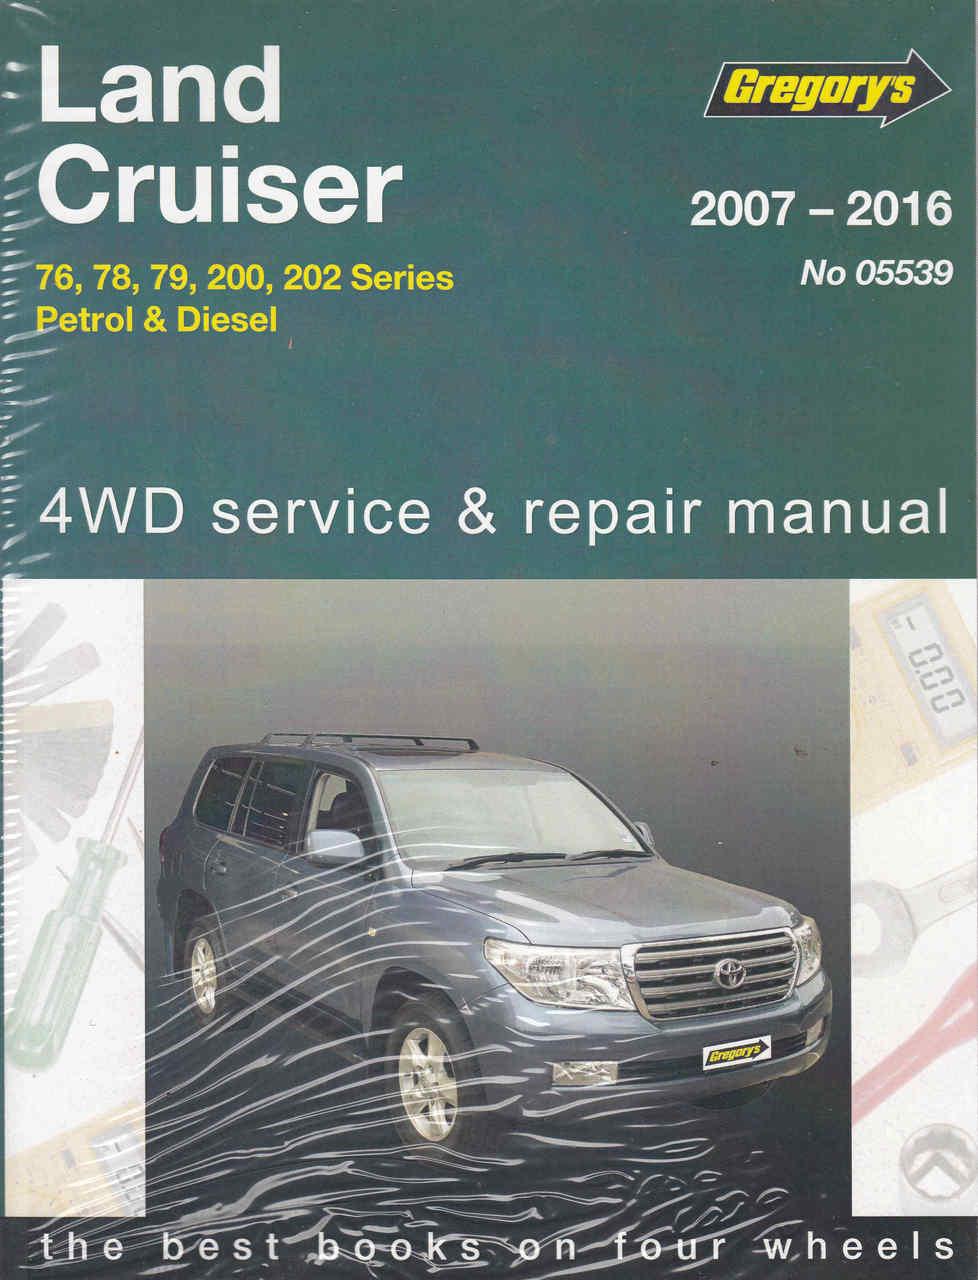 toyota land cruiser 76 78 79 200 202 series 2007 2016 petrol rh automotobookshop com au manual toyota land cruiser prado manual toyota land cruiser prado